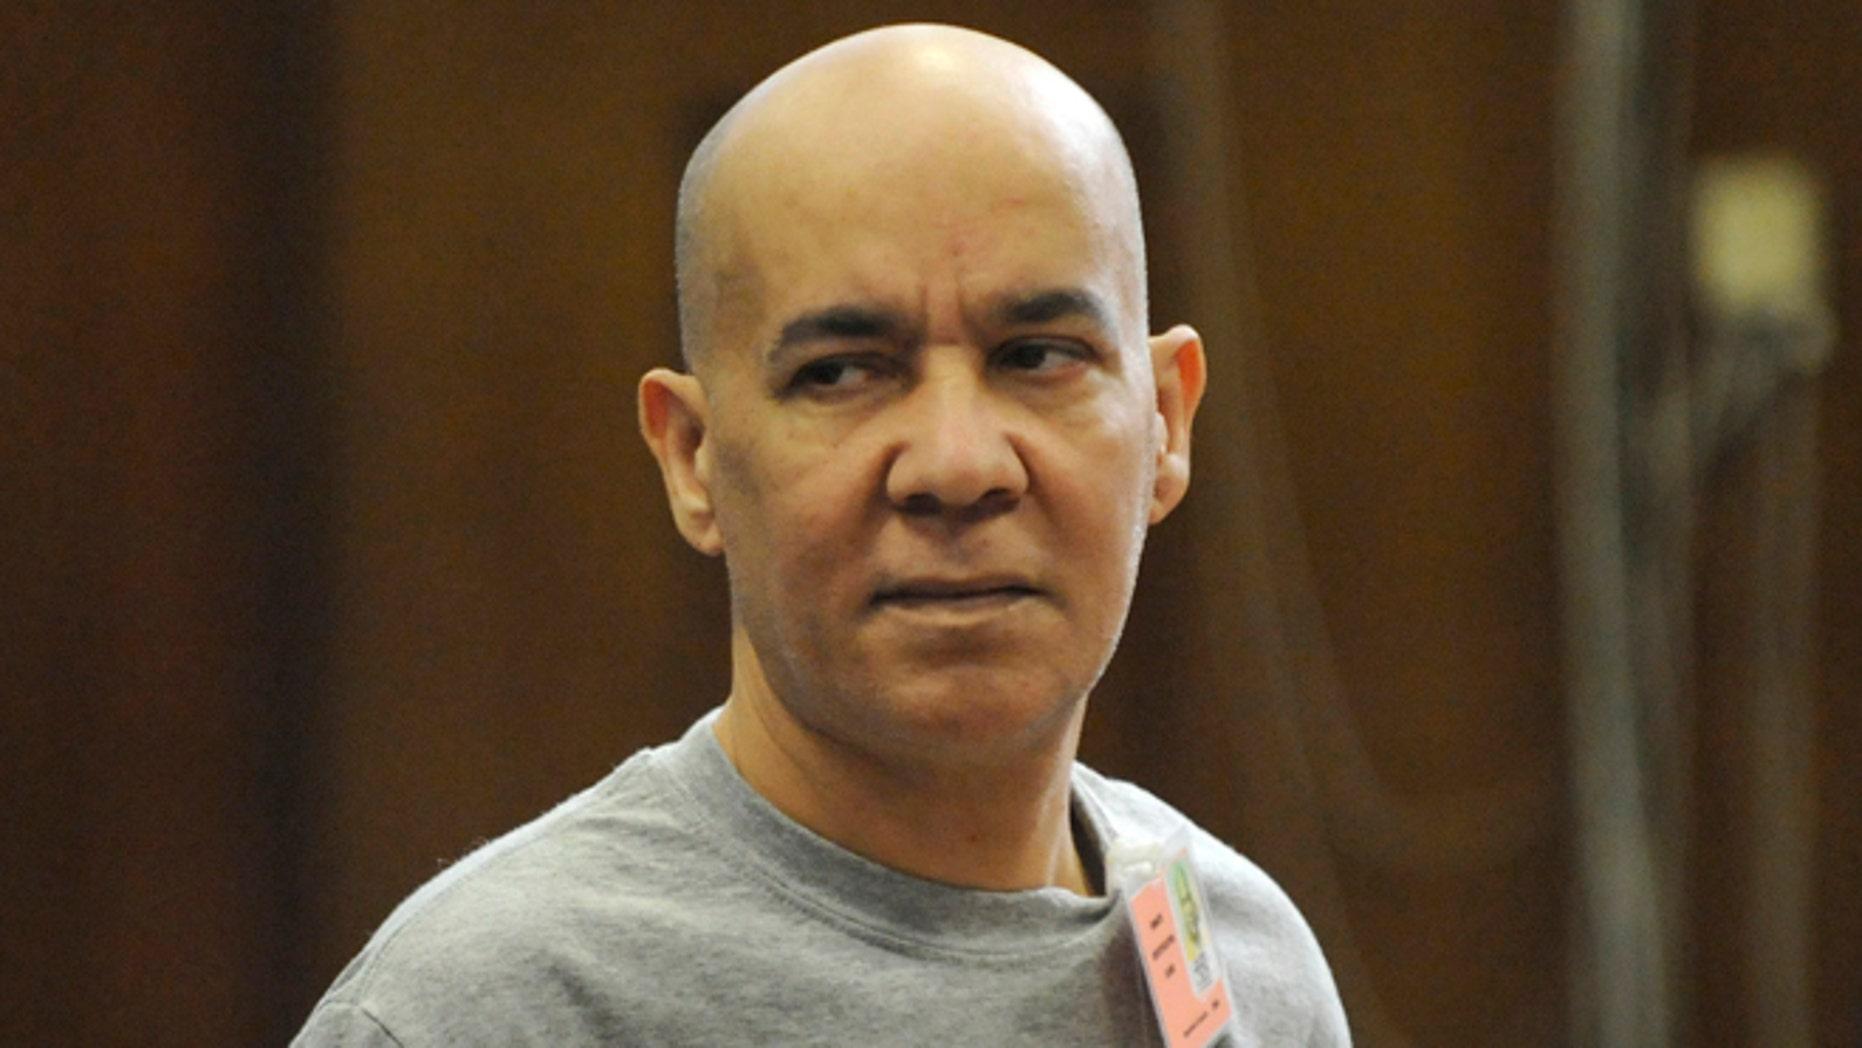 Pedro Hernandez in Manhattan criminal court in New York.